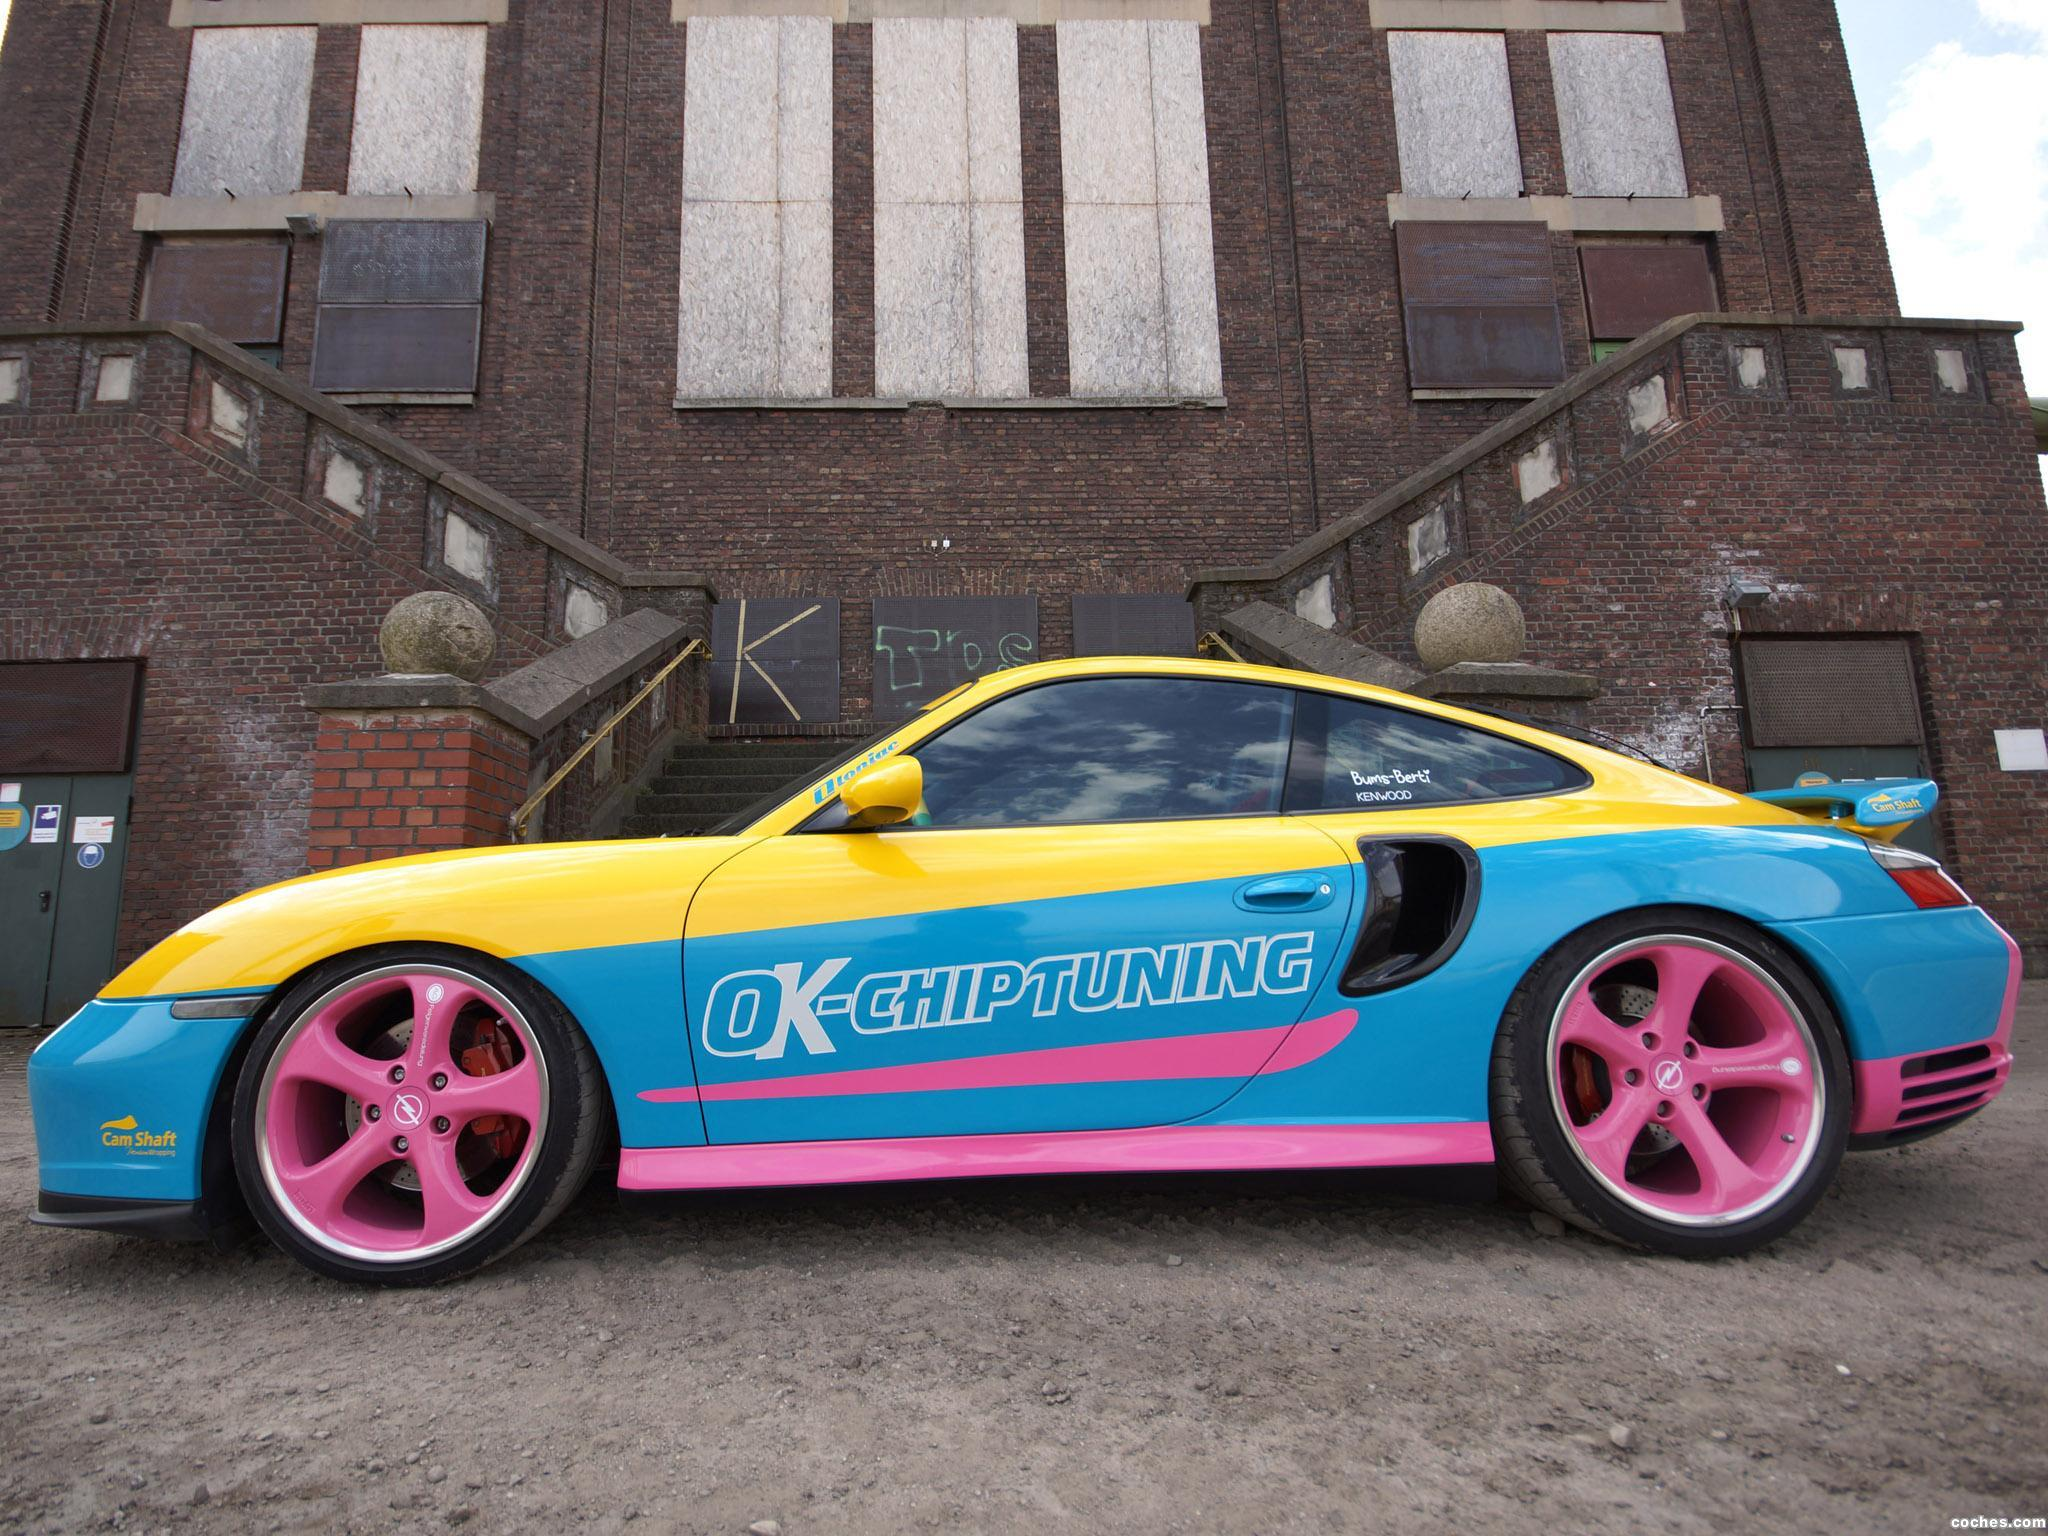 Foto 2 de Cam Shaft Porsche 911 Turbo Ok Chiptuning Manta Tuning 2013